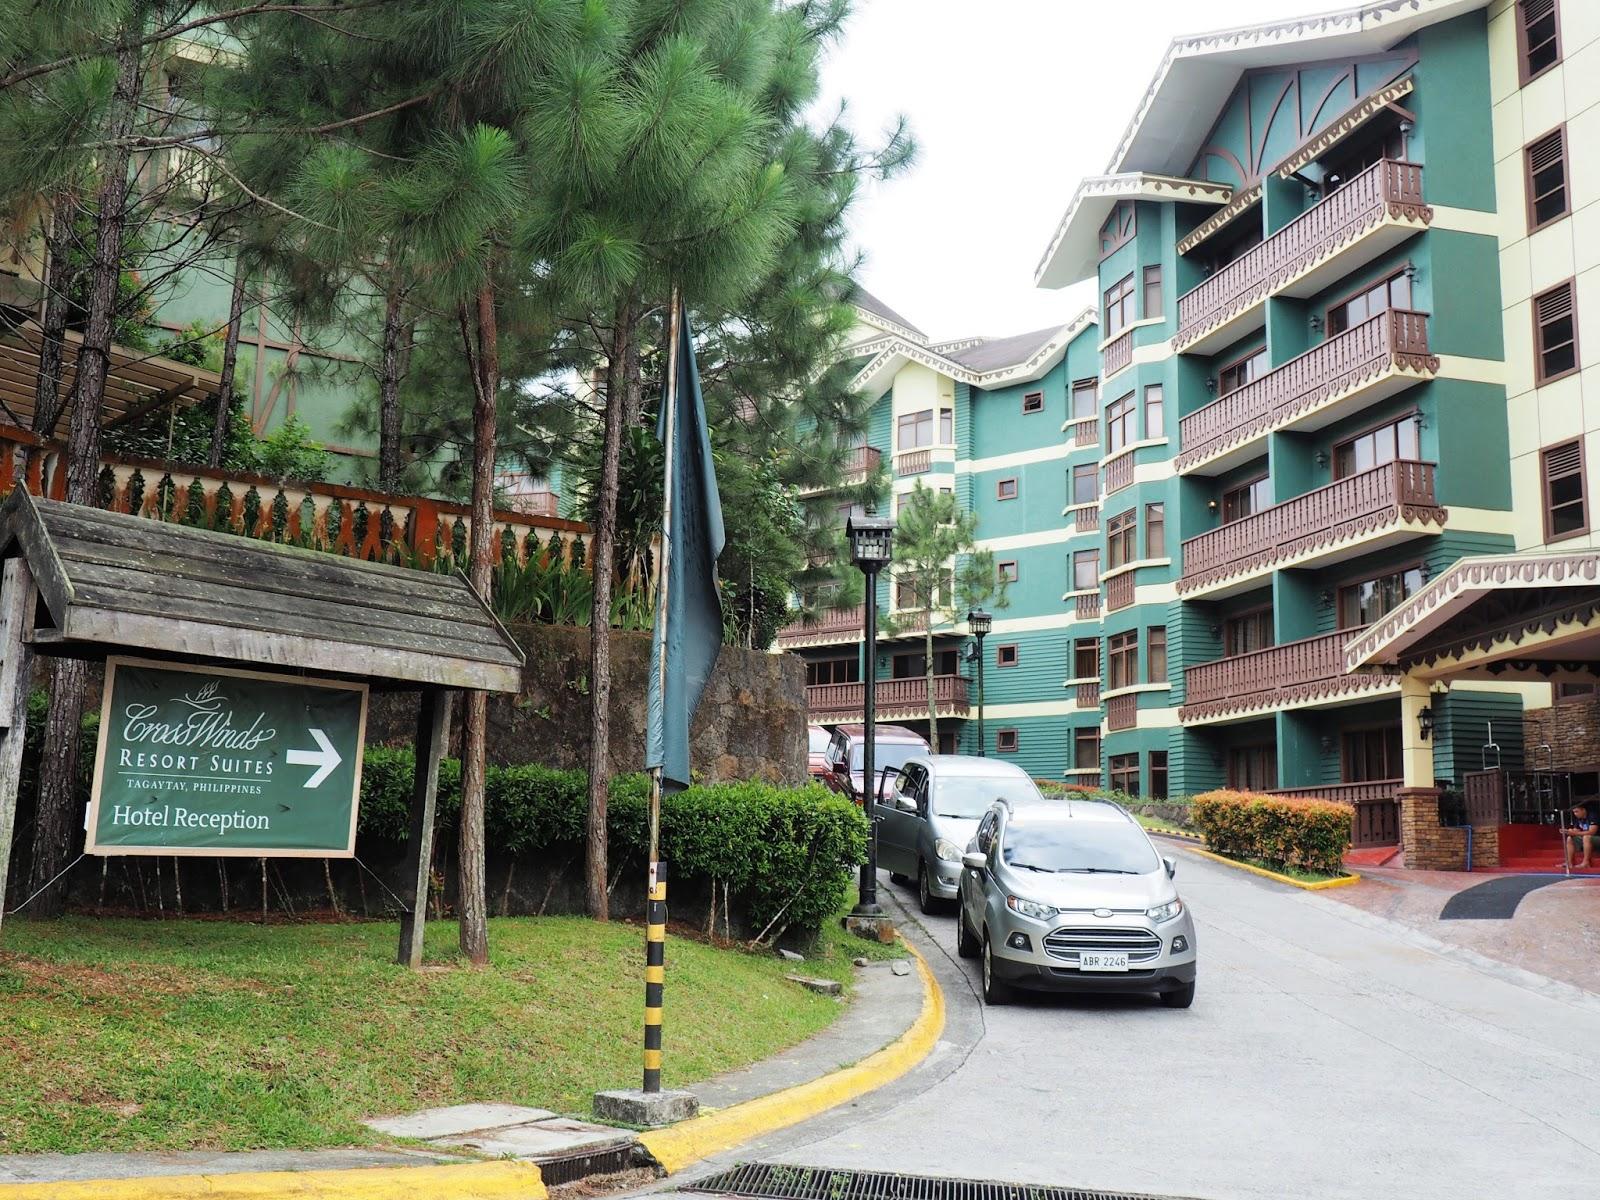 Vinatraveler 39 s blog crosswinds resort suites the most - Crosswinds tagaytay swimming pool ...